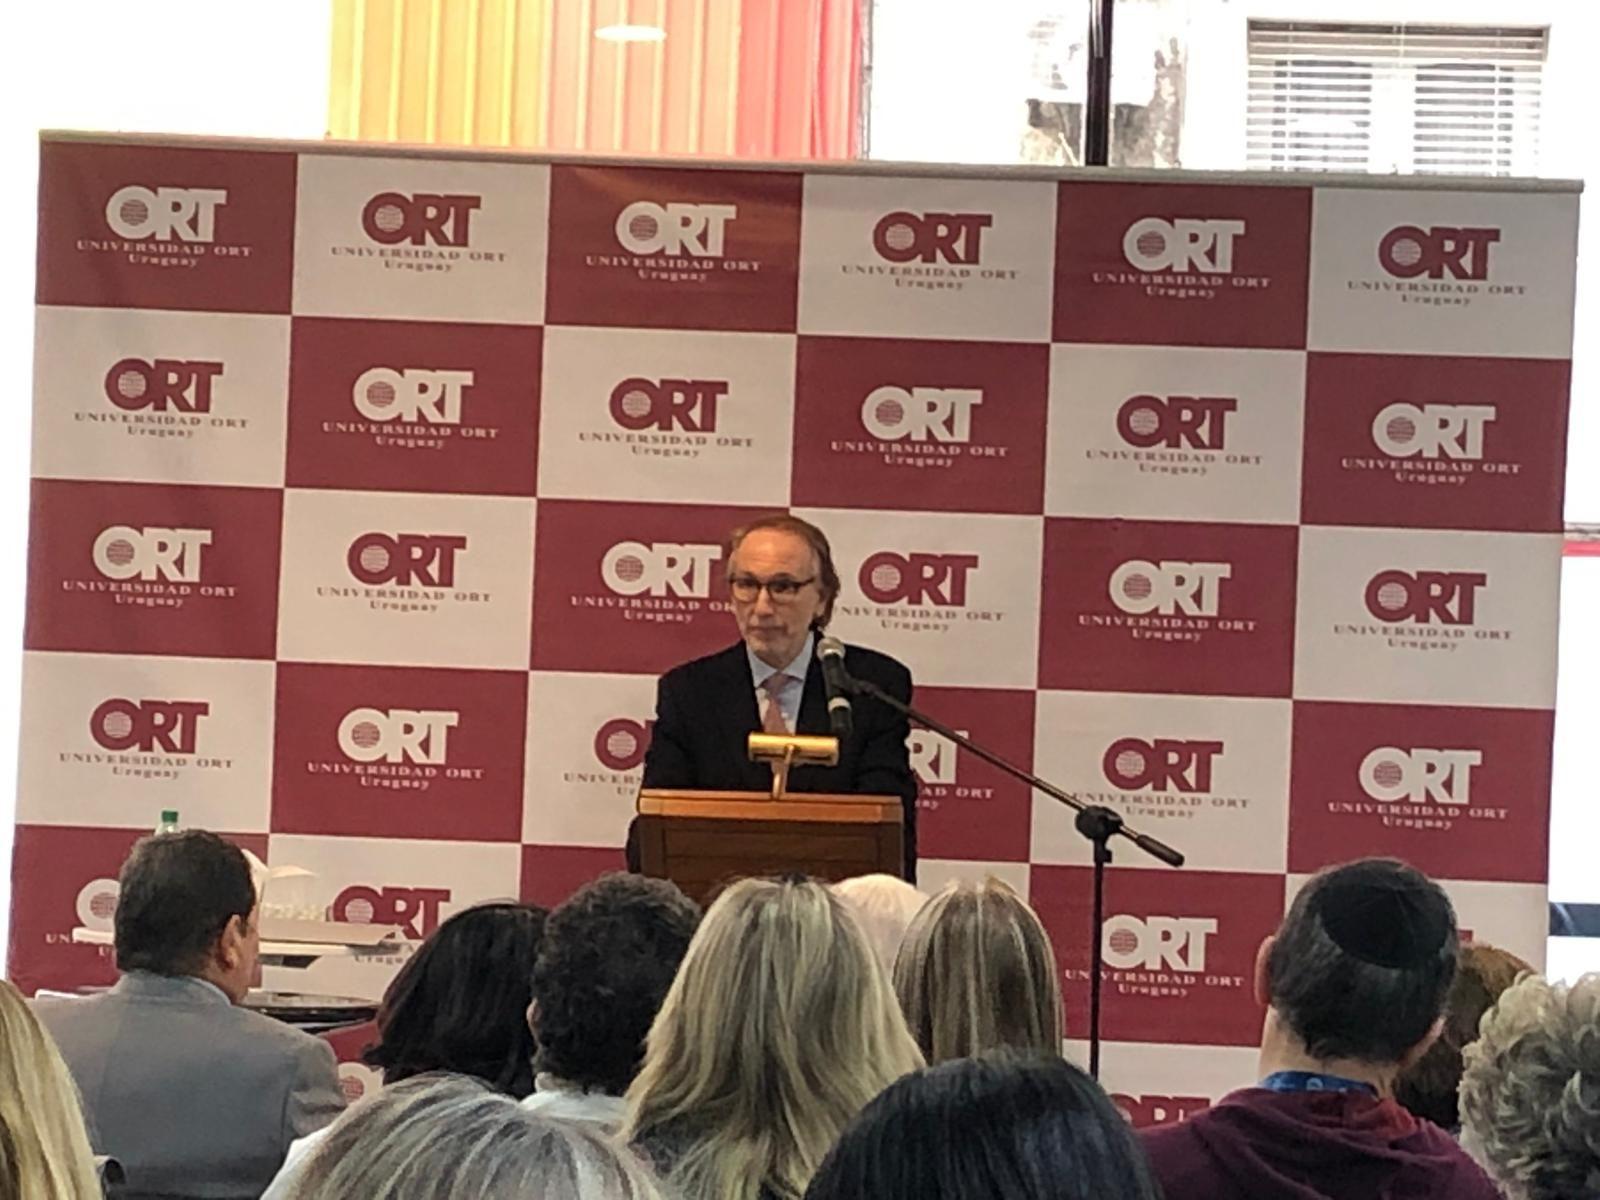 Dr. Jorge Grunberg, Director of ORT University Uruguay